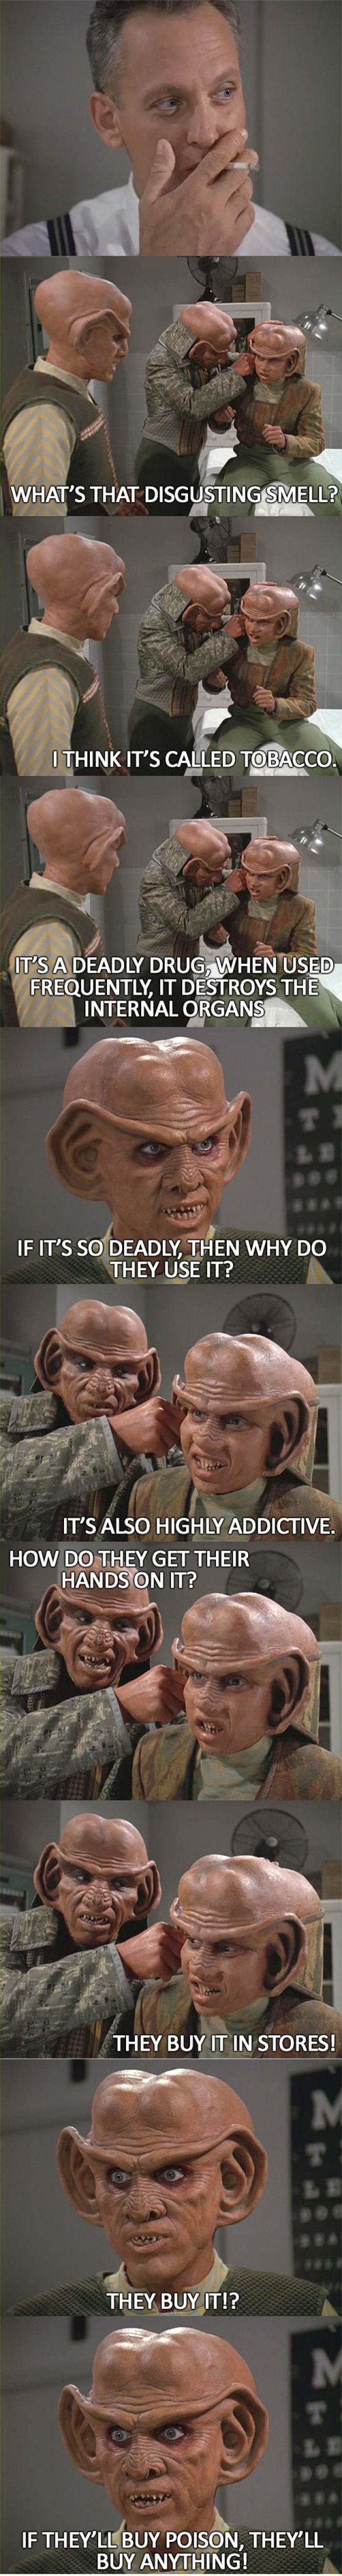 Ferengi view of tobacco problem...